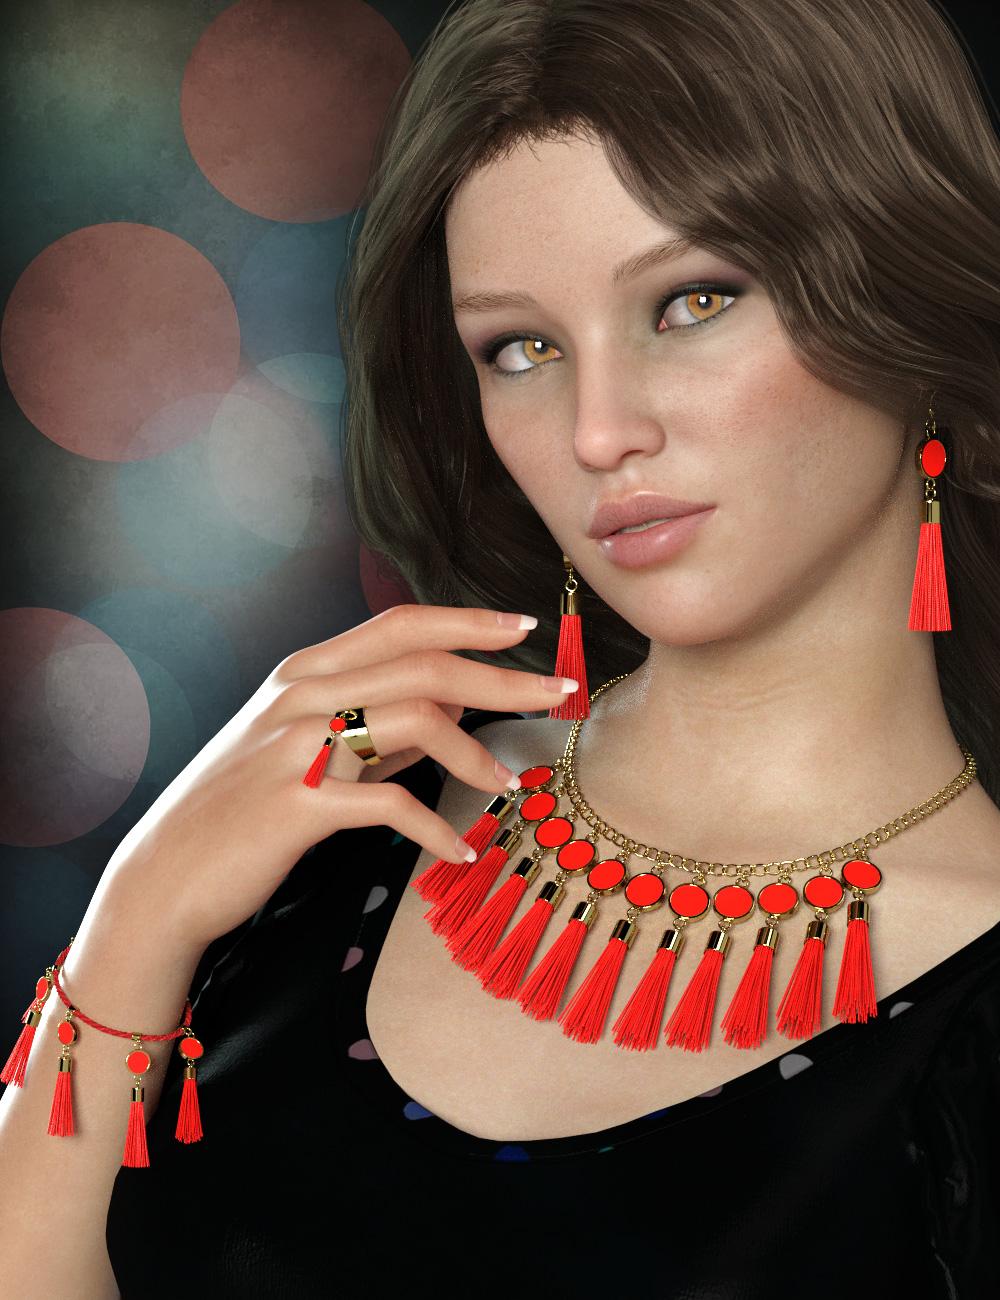 Tassel Jewelry Mega Pack for Genesis 8 Female(s) by: esha, 3D Models by Daz 3D